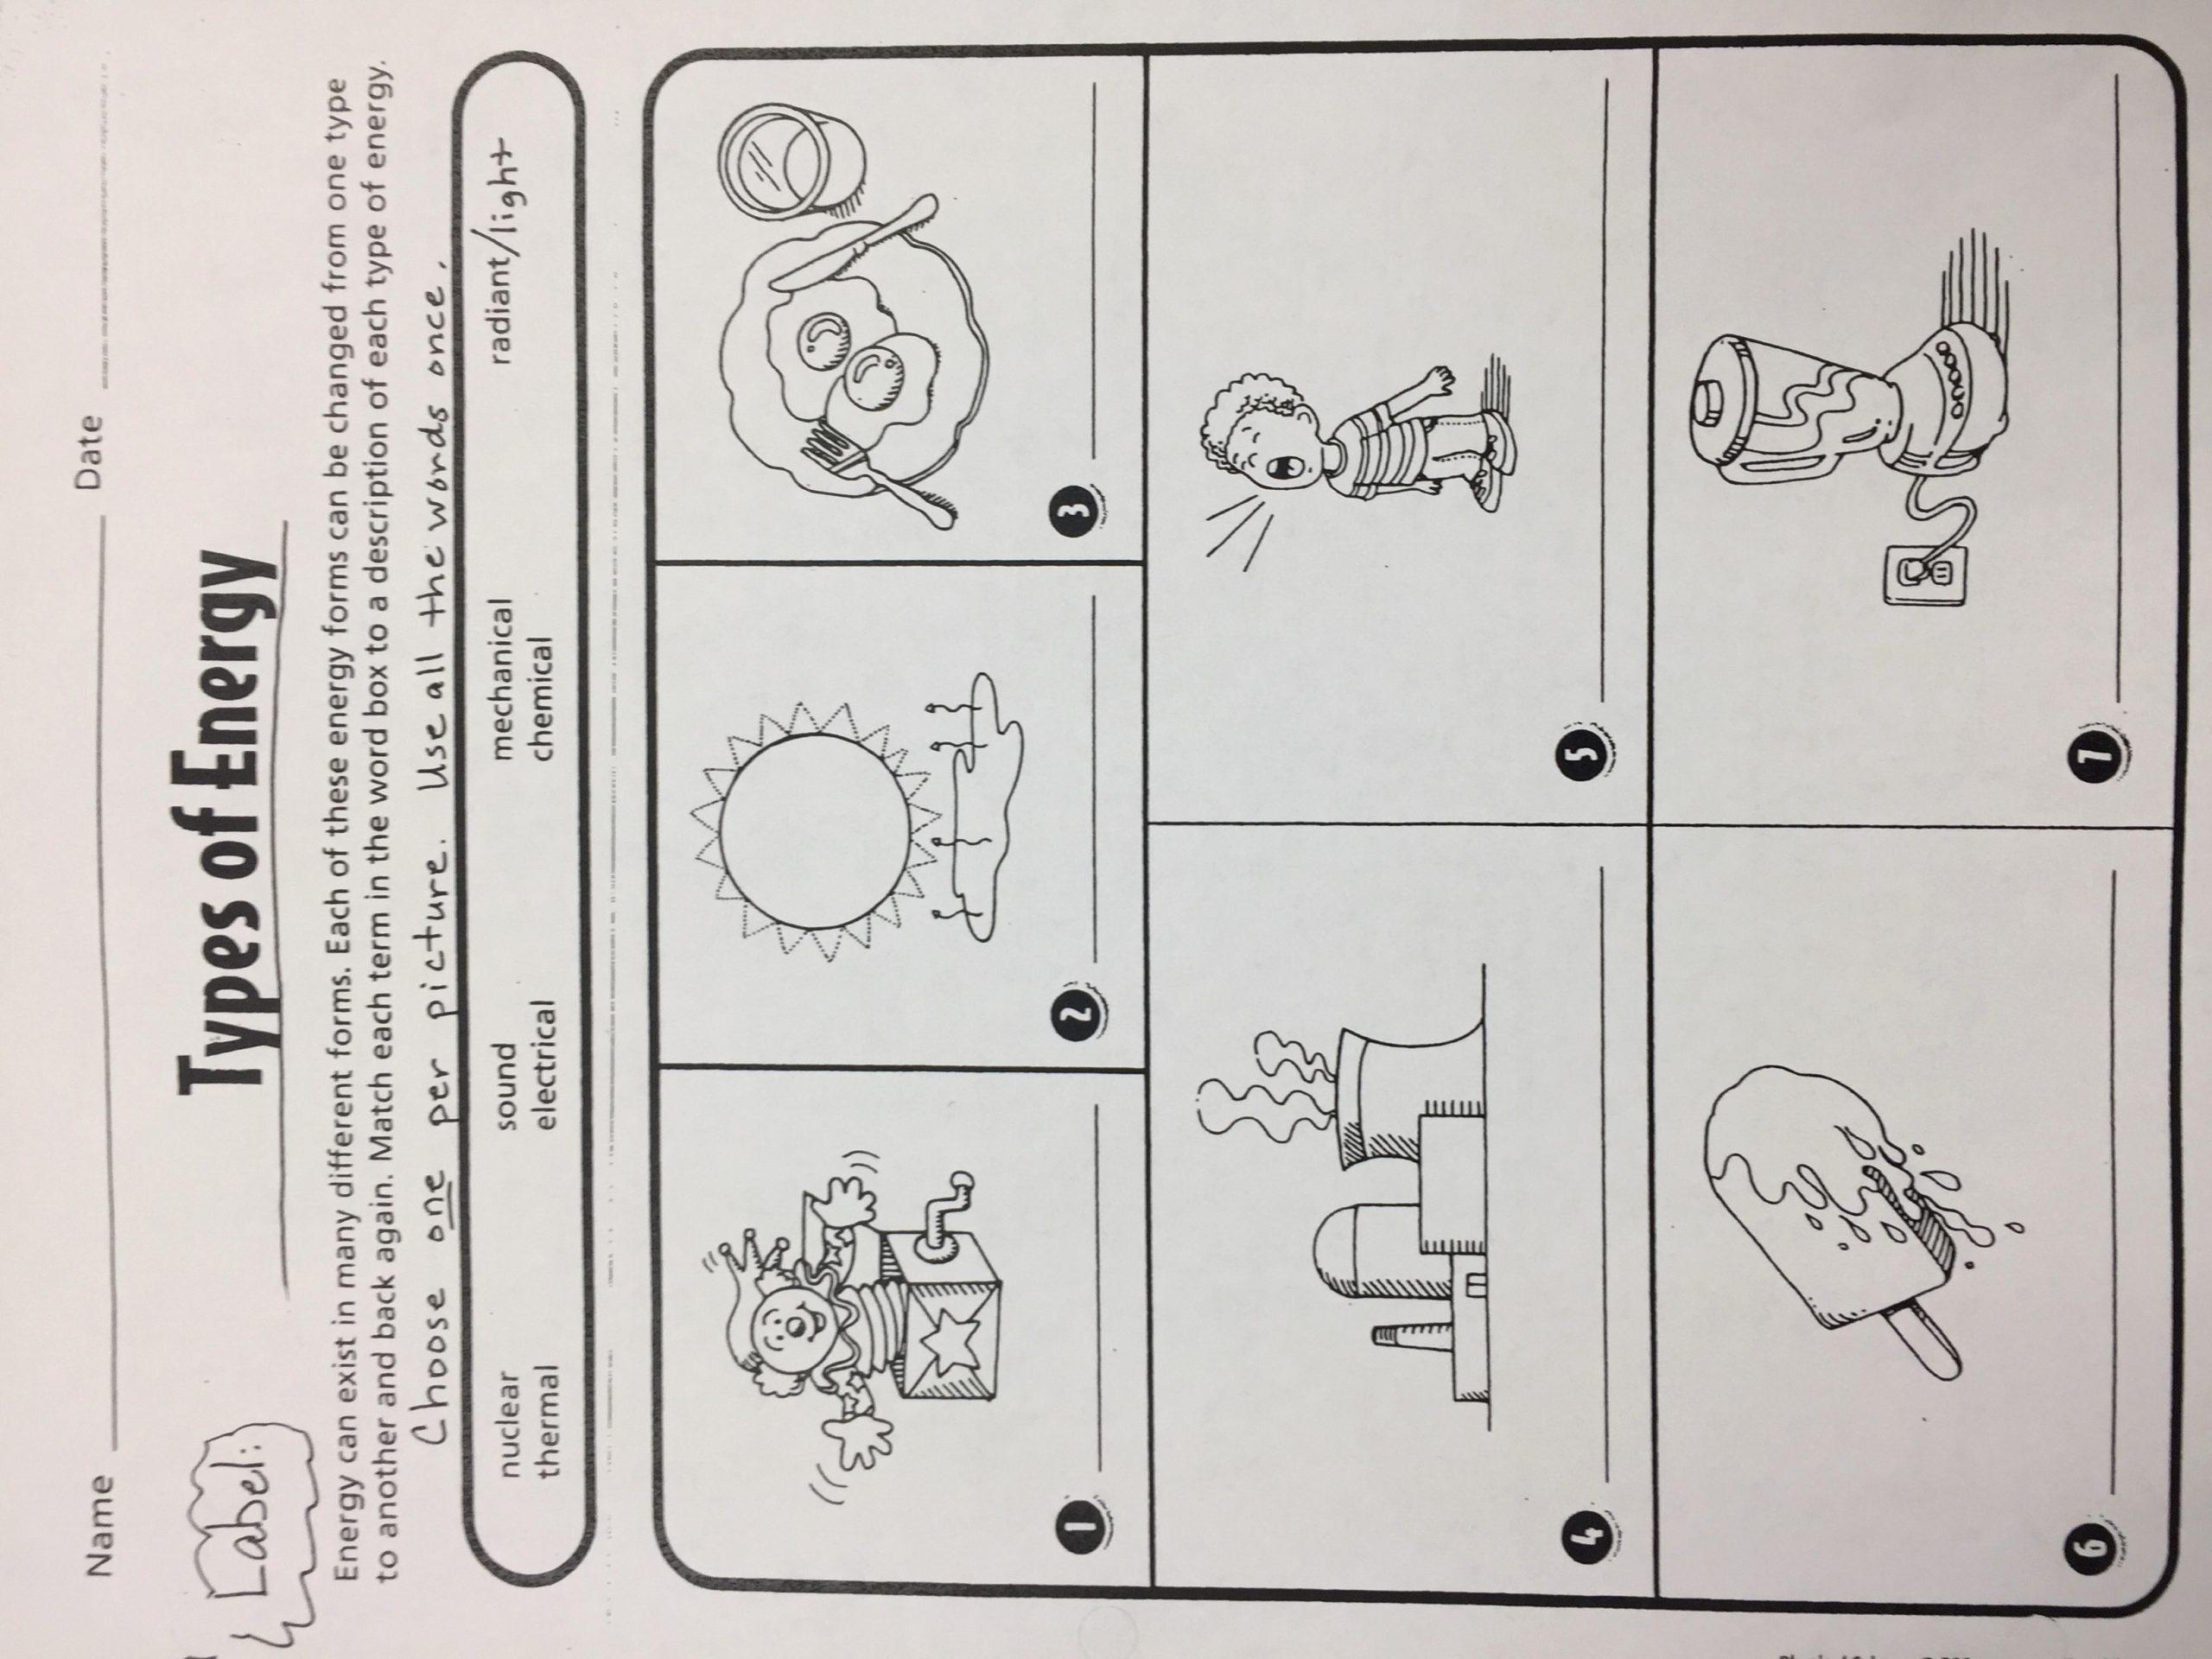 Energy Worksheets Middle School Pdf Inspirational forms Energy Worksheet Worksheet List